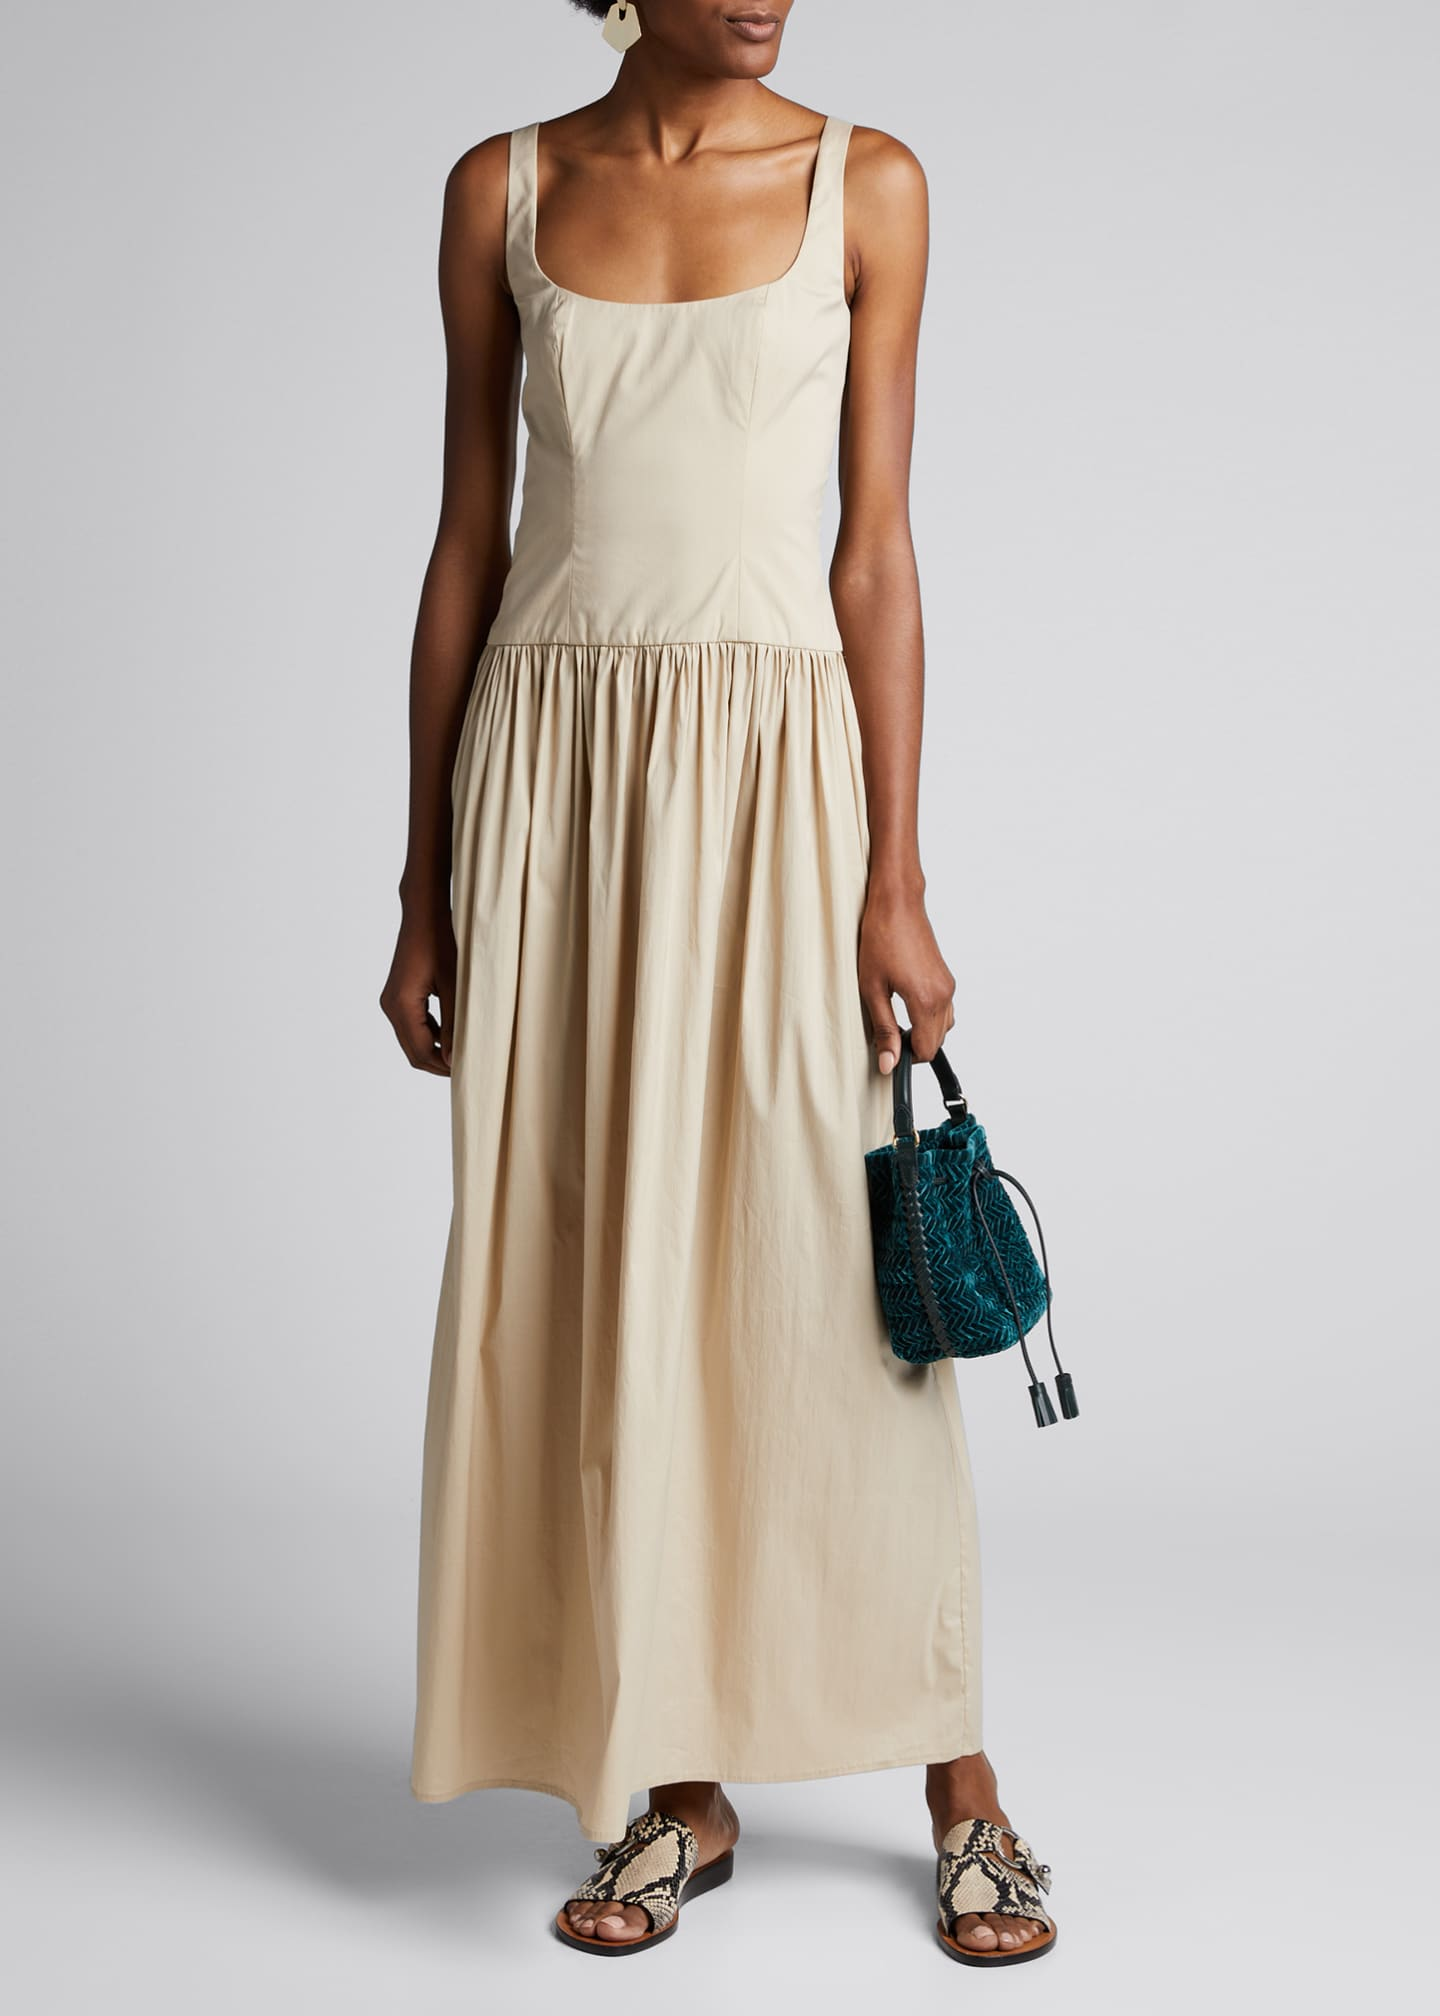 Anna Quan Gisele Square-Neck Stretch Cotton Long Dress